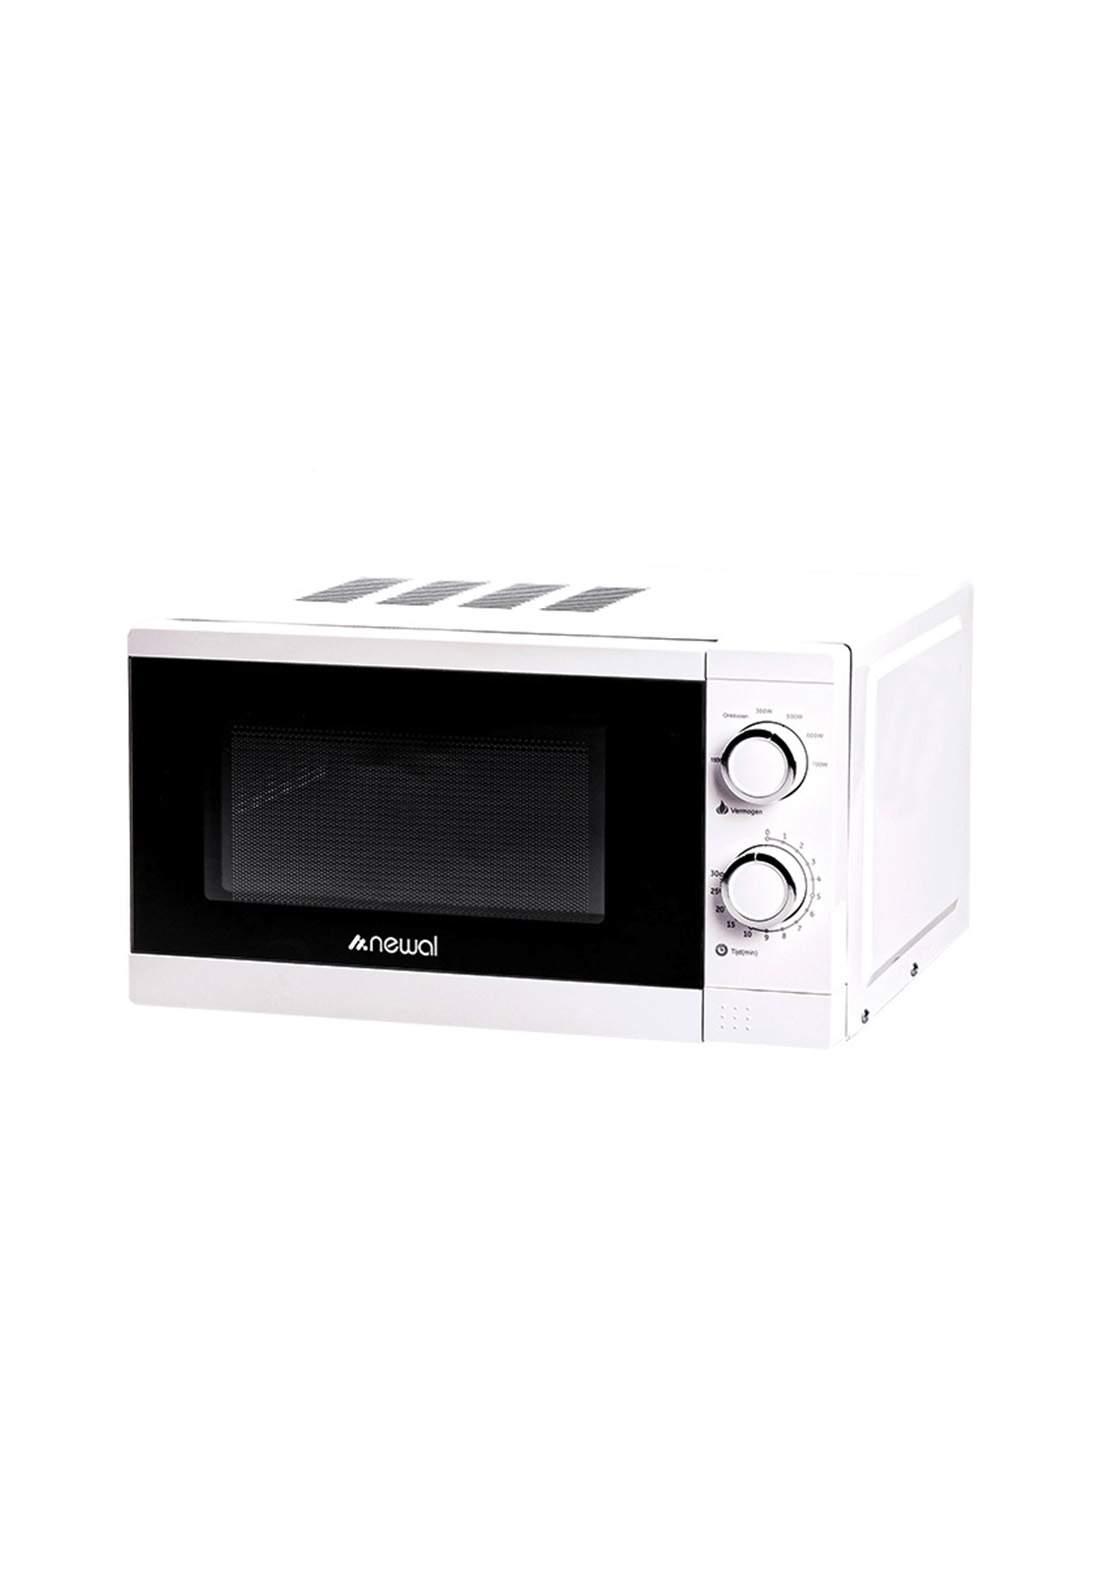 Newal MWO-264 Microvawe Oven فرن مايكروويف